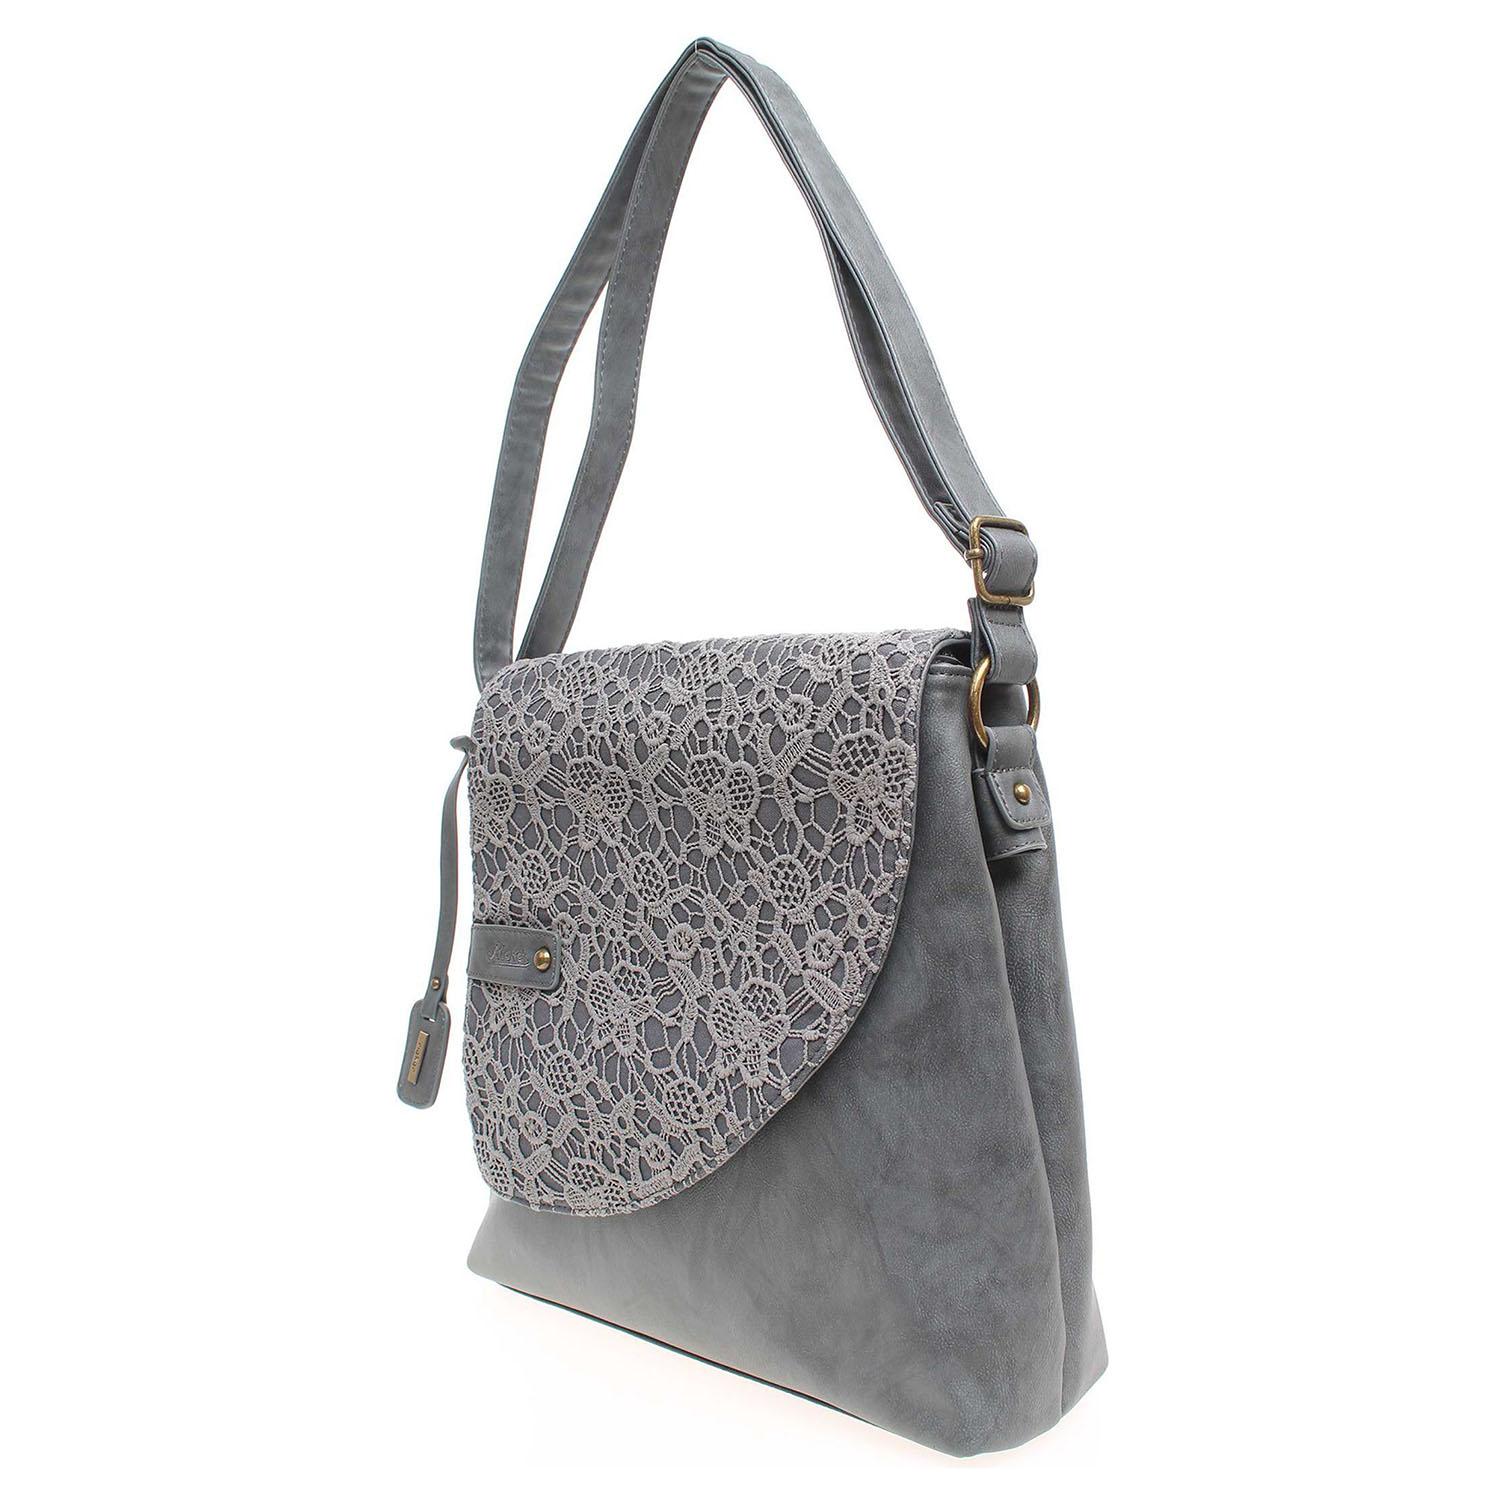 Ecco Rieker dámská kabelka H1107-15 šedá 11891137